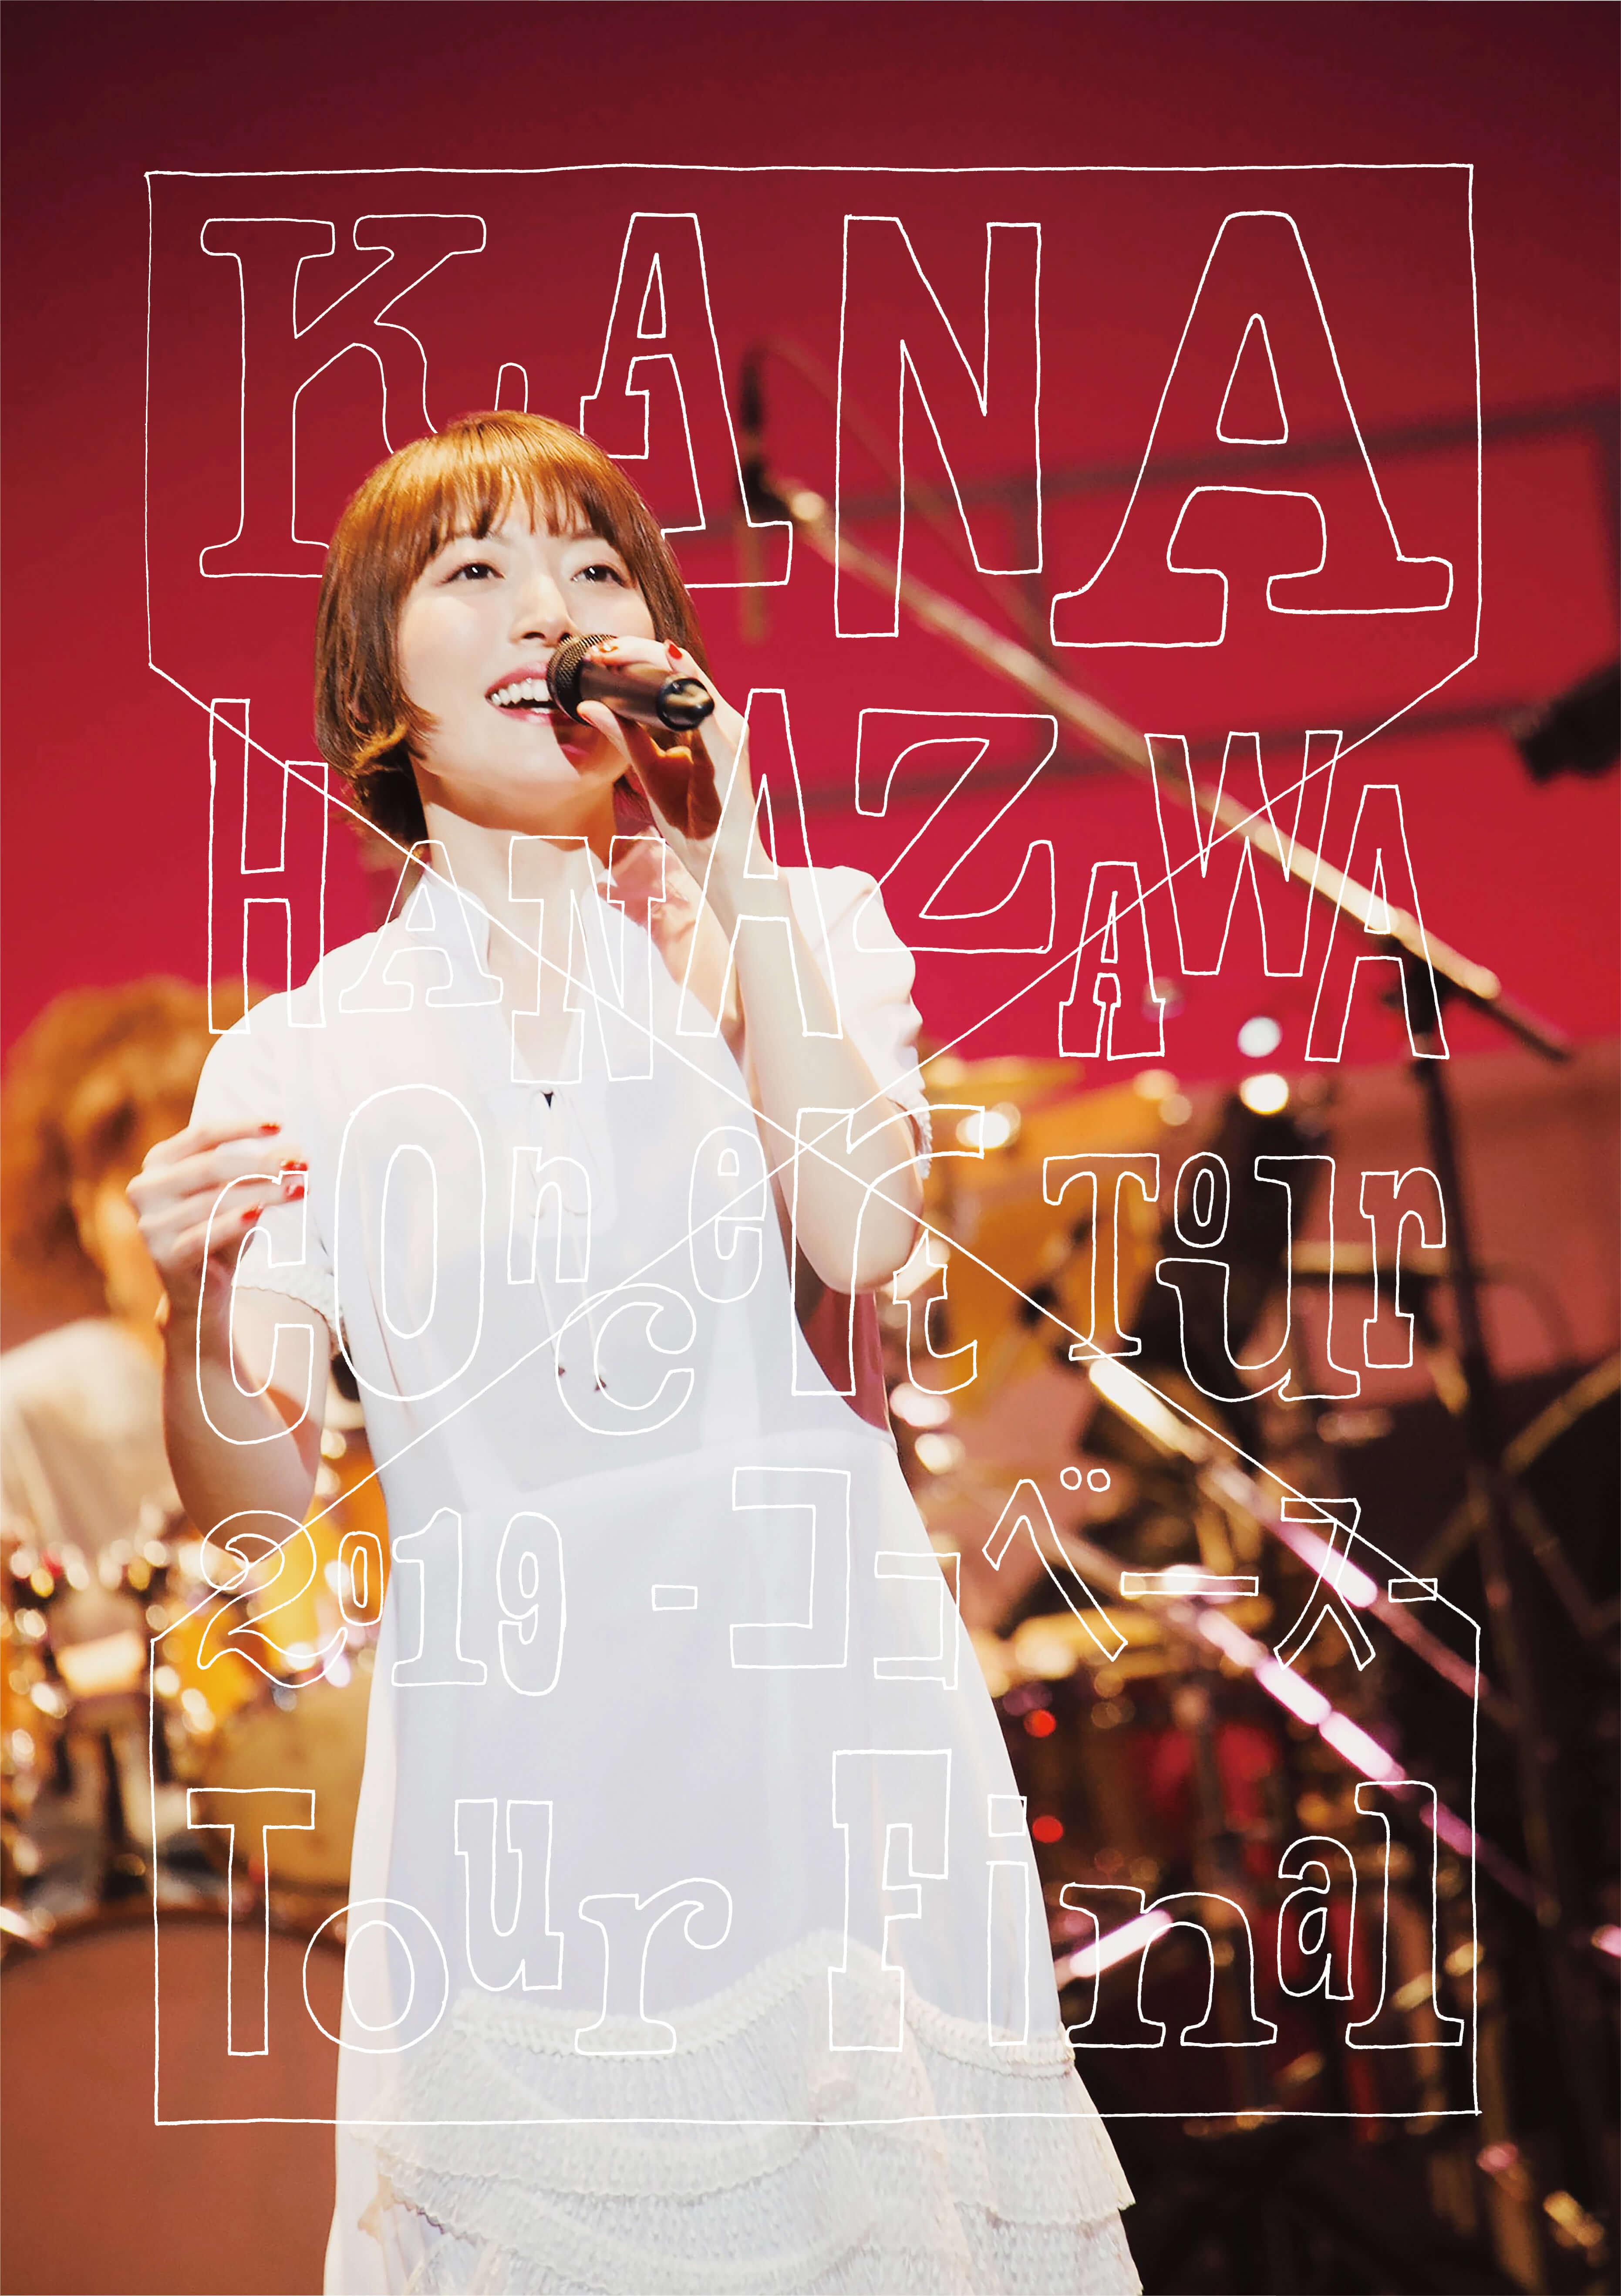 live-bd%e3%80%8ckana-hanazawa-concert-tour-2019%e3%80%8djk%e5%86%99-1-2